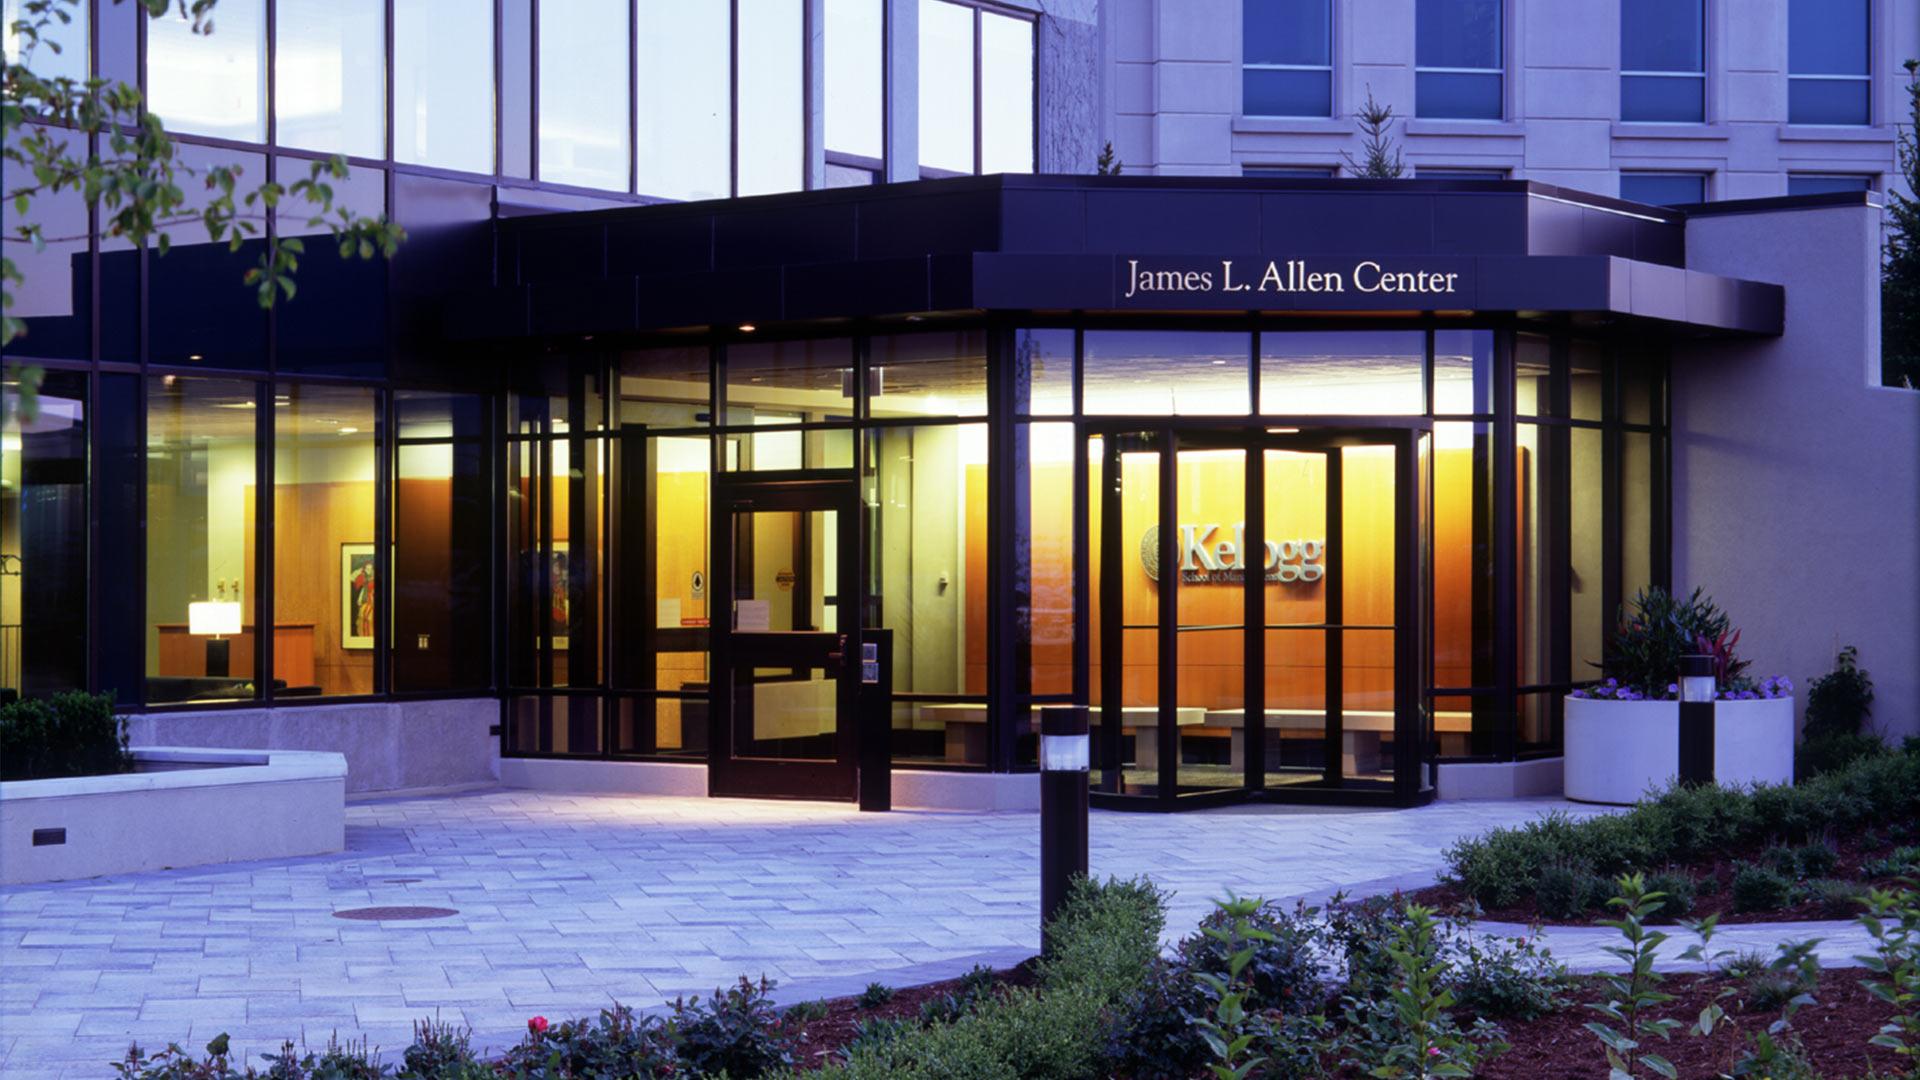 Northwestern University Kellogg Graduate School of Management James L. Allen Center